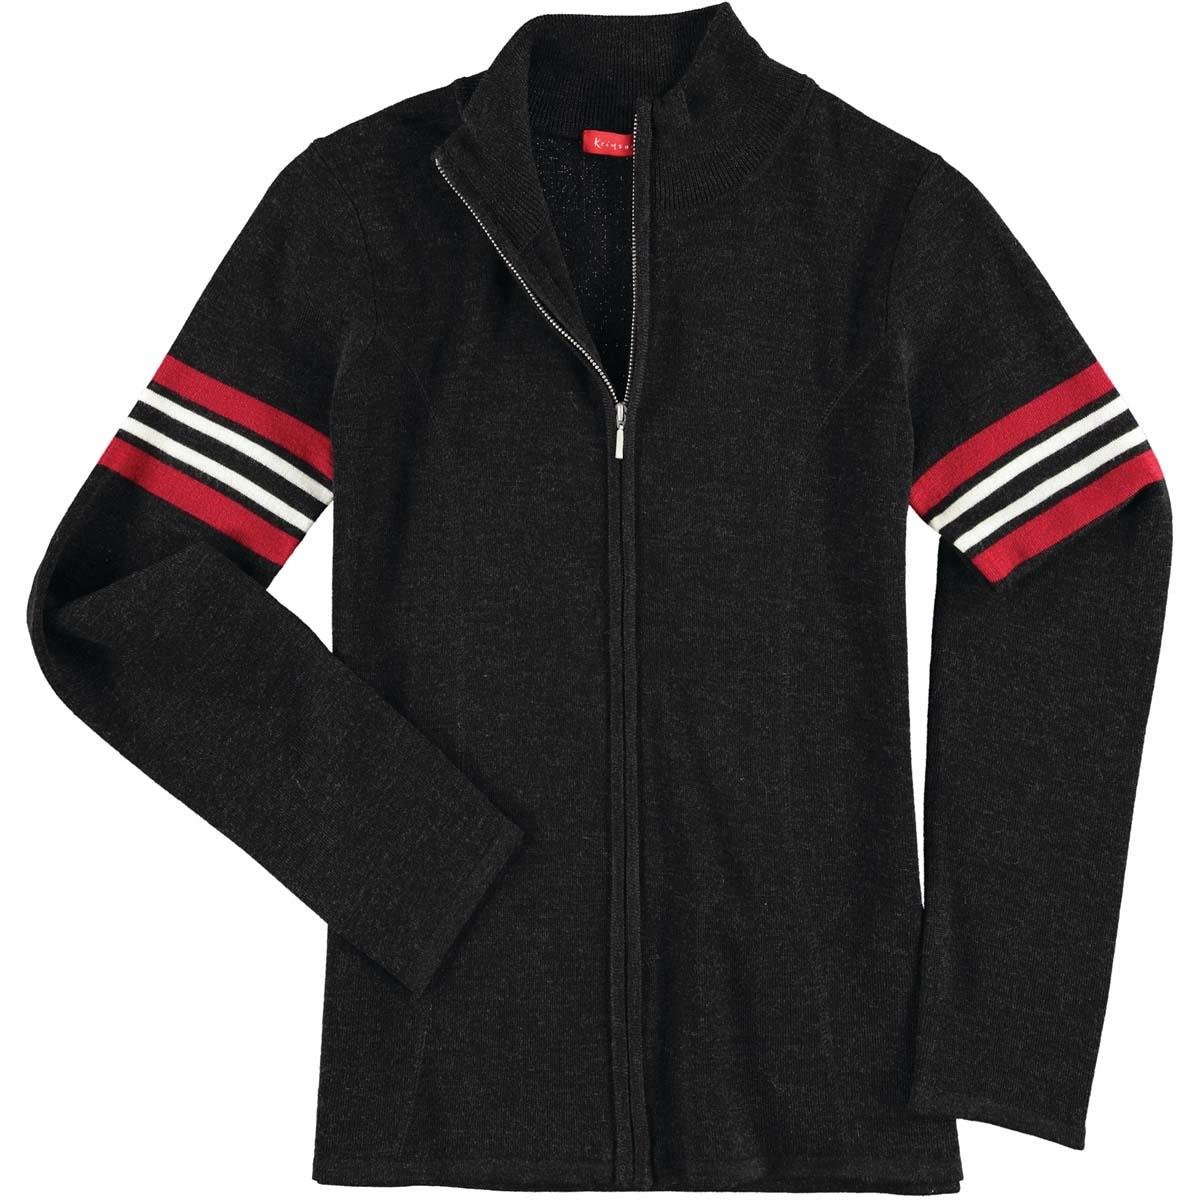 Krimson Klover Bette Full Zipプルオーバーメリノウールセーター – 追加のサイズと色使用可能 B073XTKSBR X-Small|ブラック ブラック X-Small